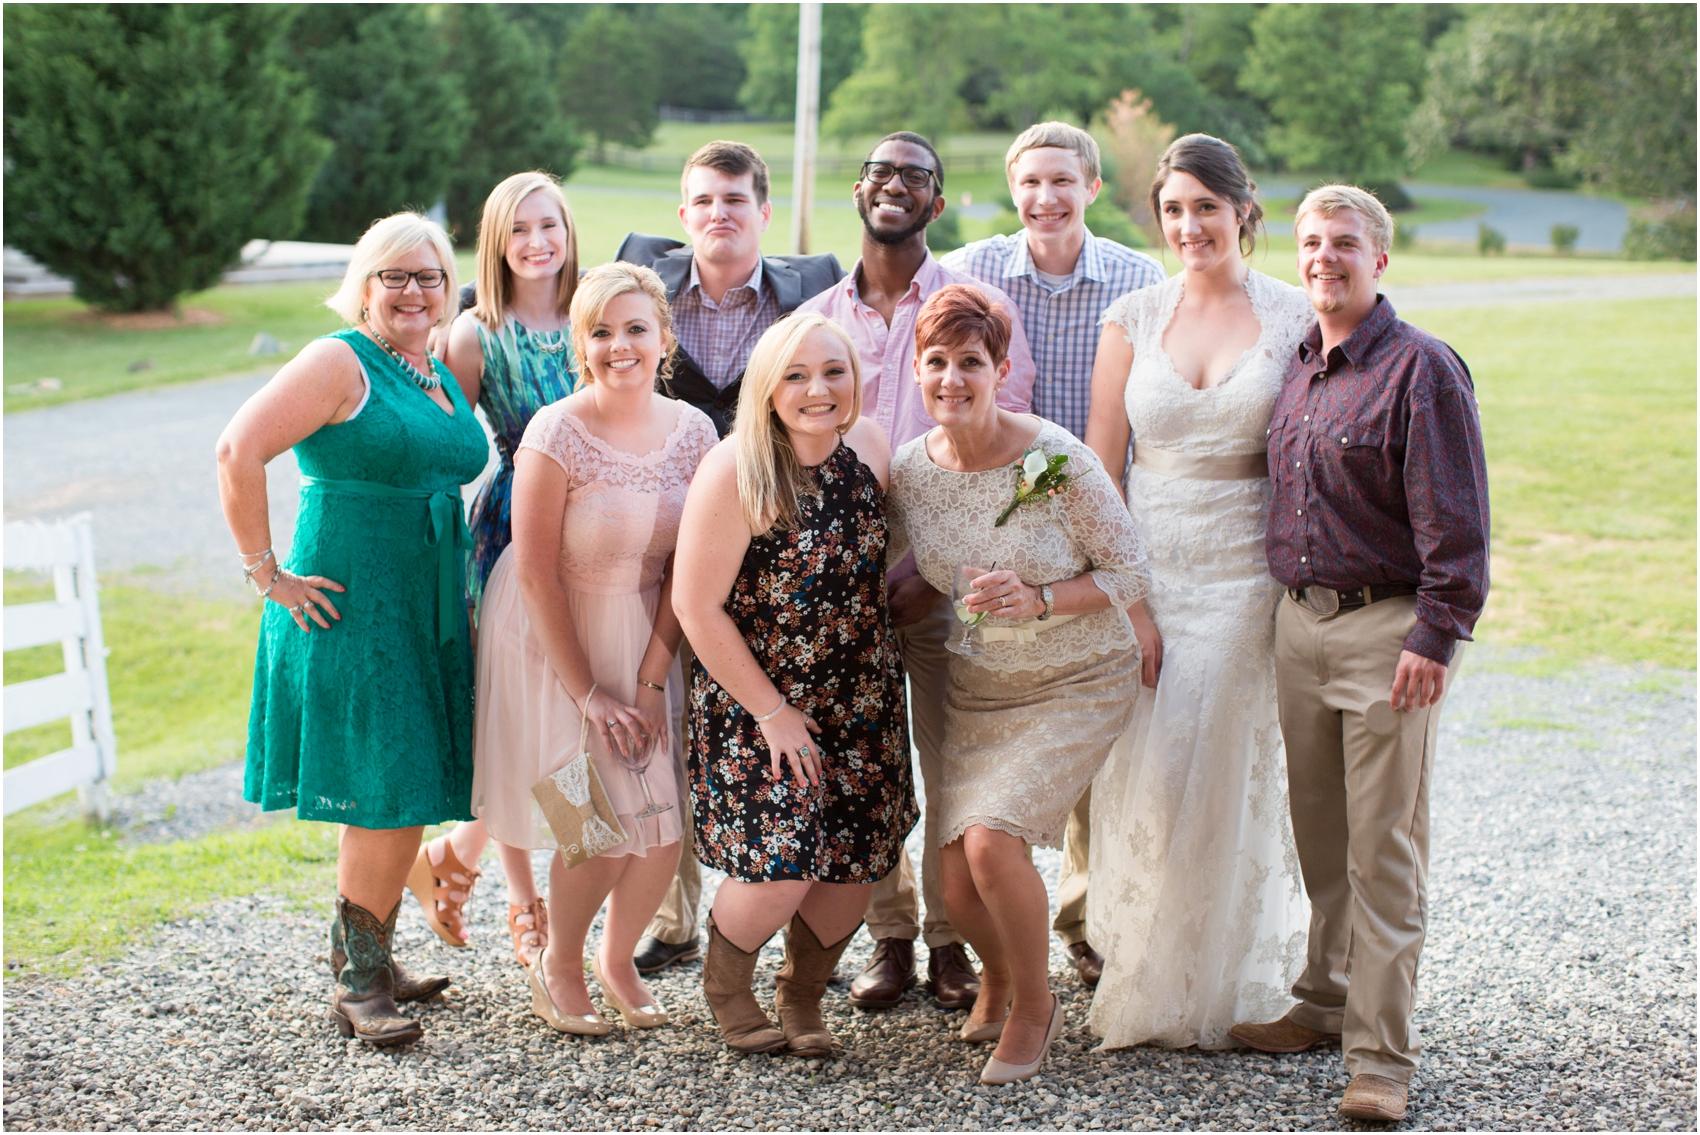 Rodes Farm Charlottesville VA Wedding-9-6.jpg